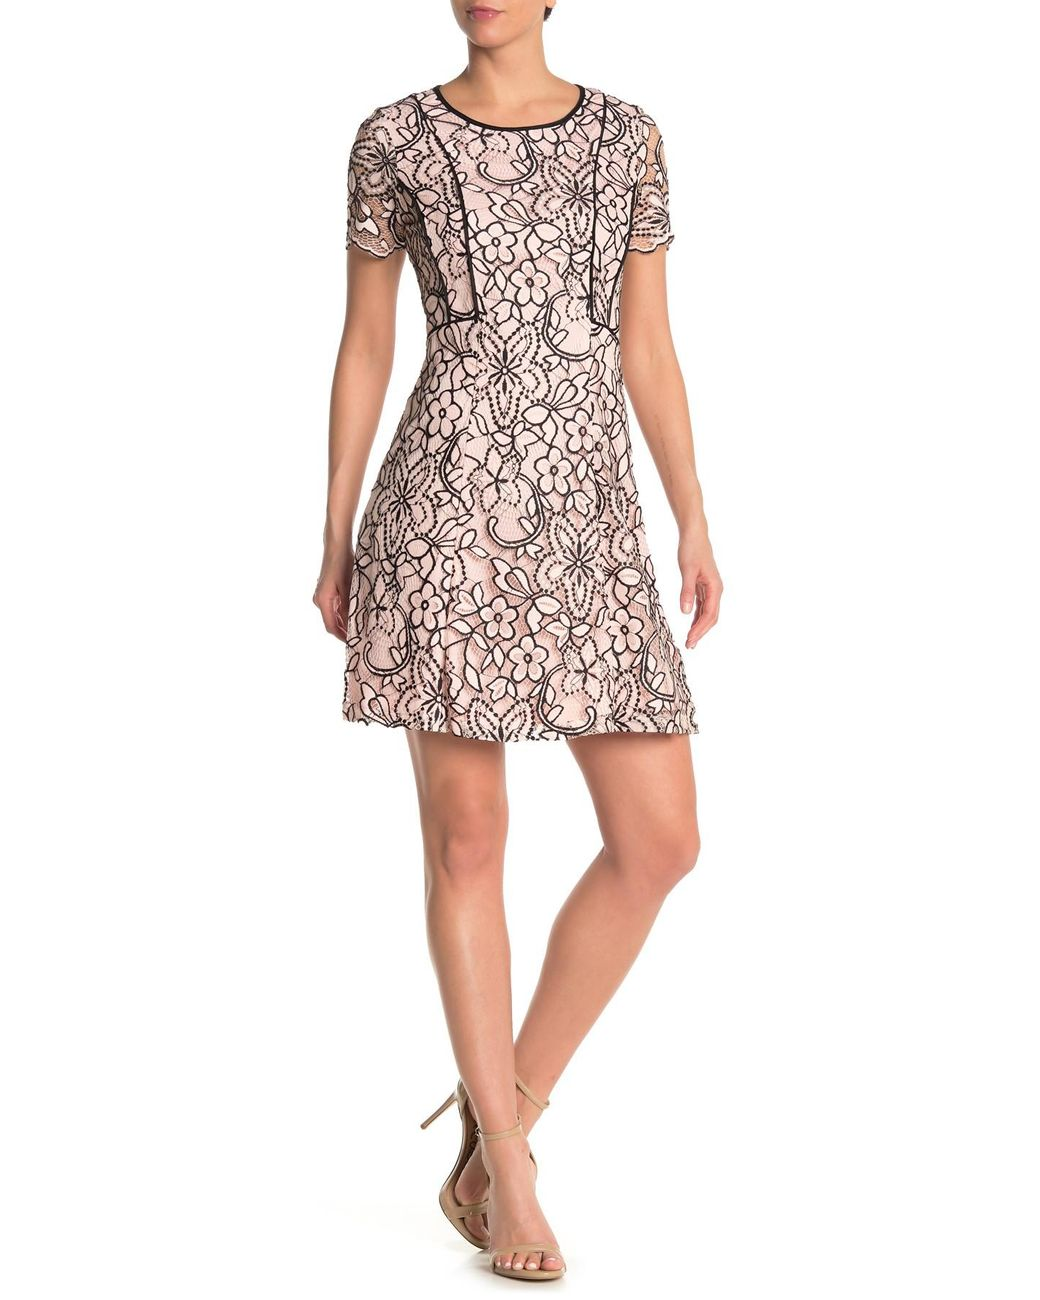 Business//Leger Sharagano Damen Double Breasted Shirt Dress Kleidung